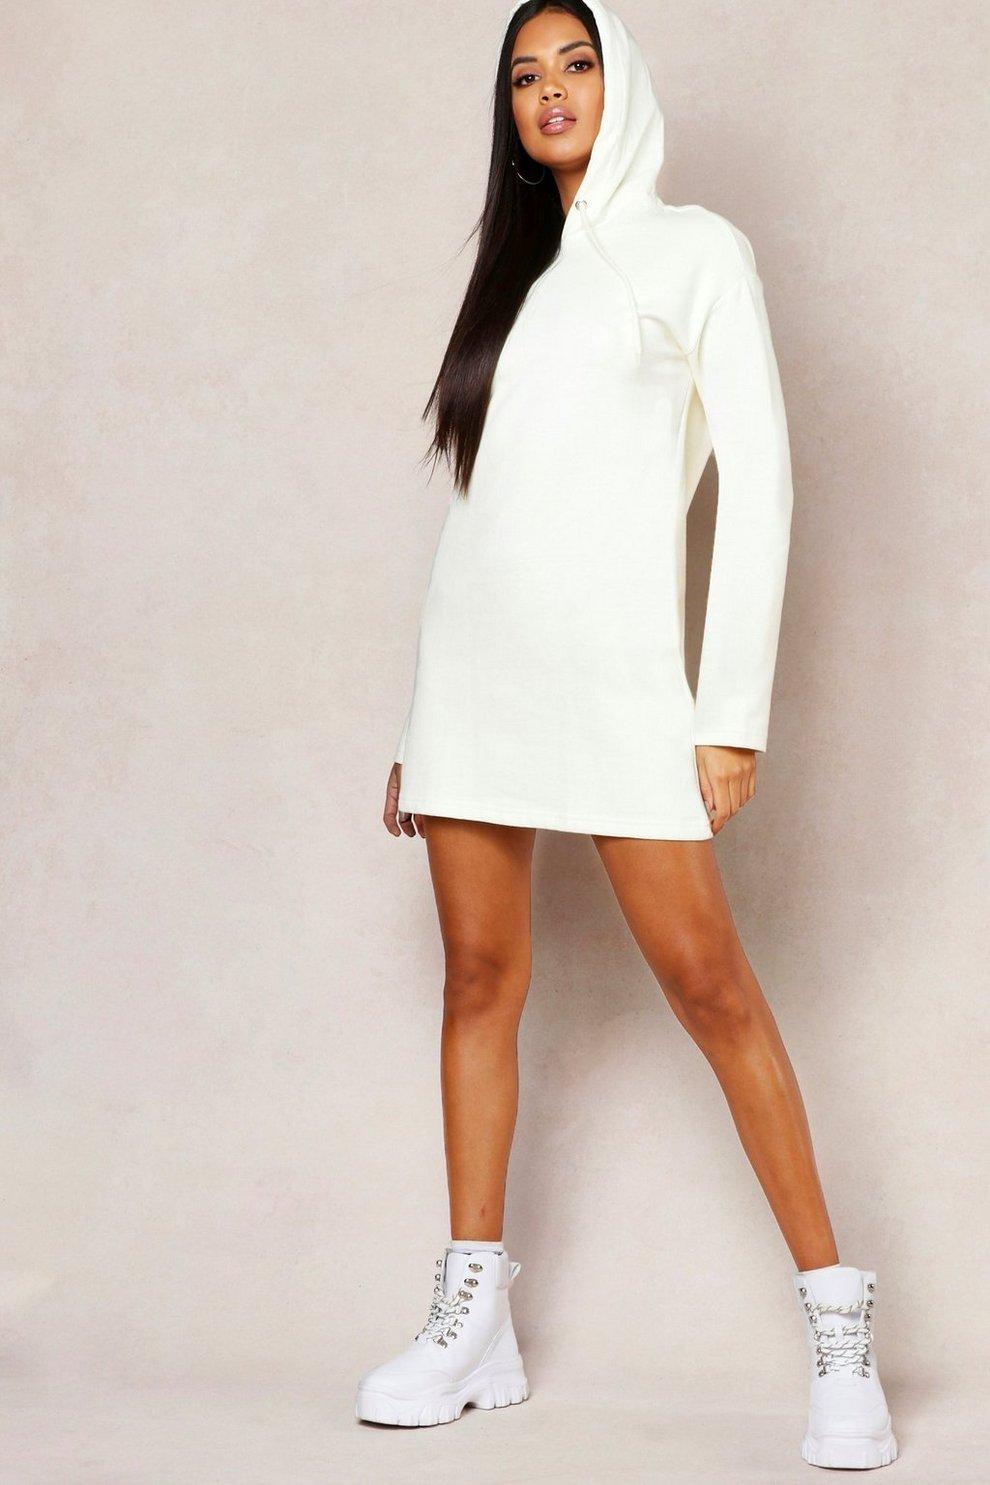 627069a3263 Womens Ecru Hooded Oversized Sweatshirt Dress